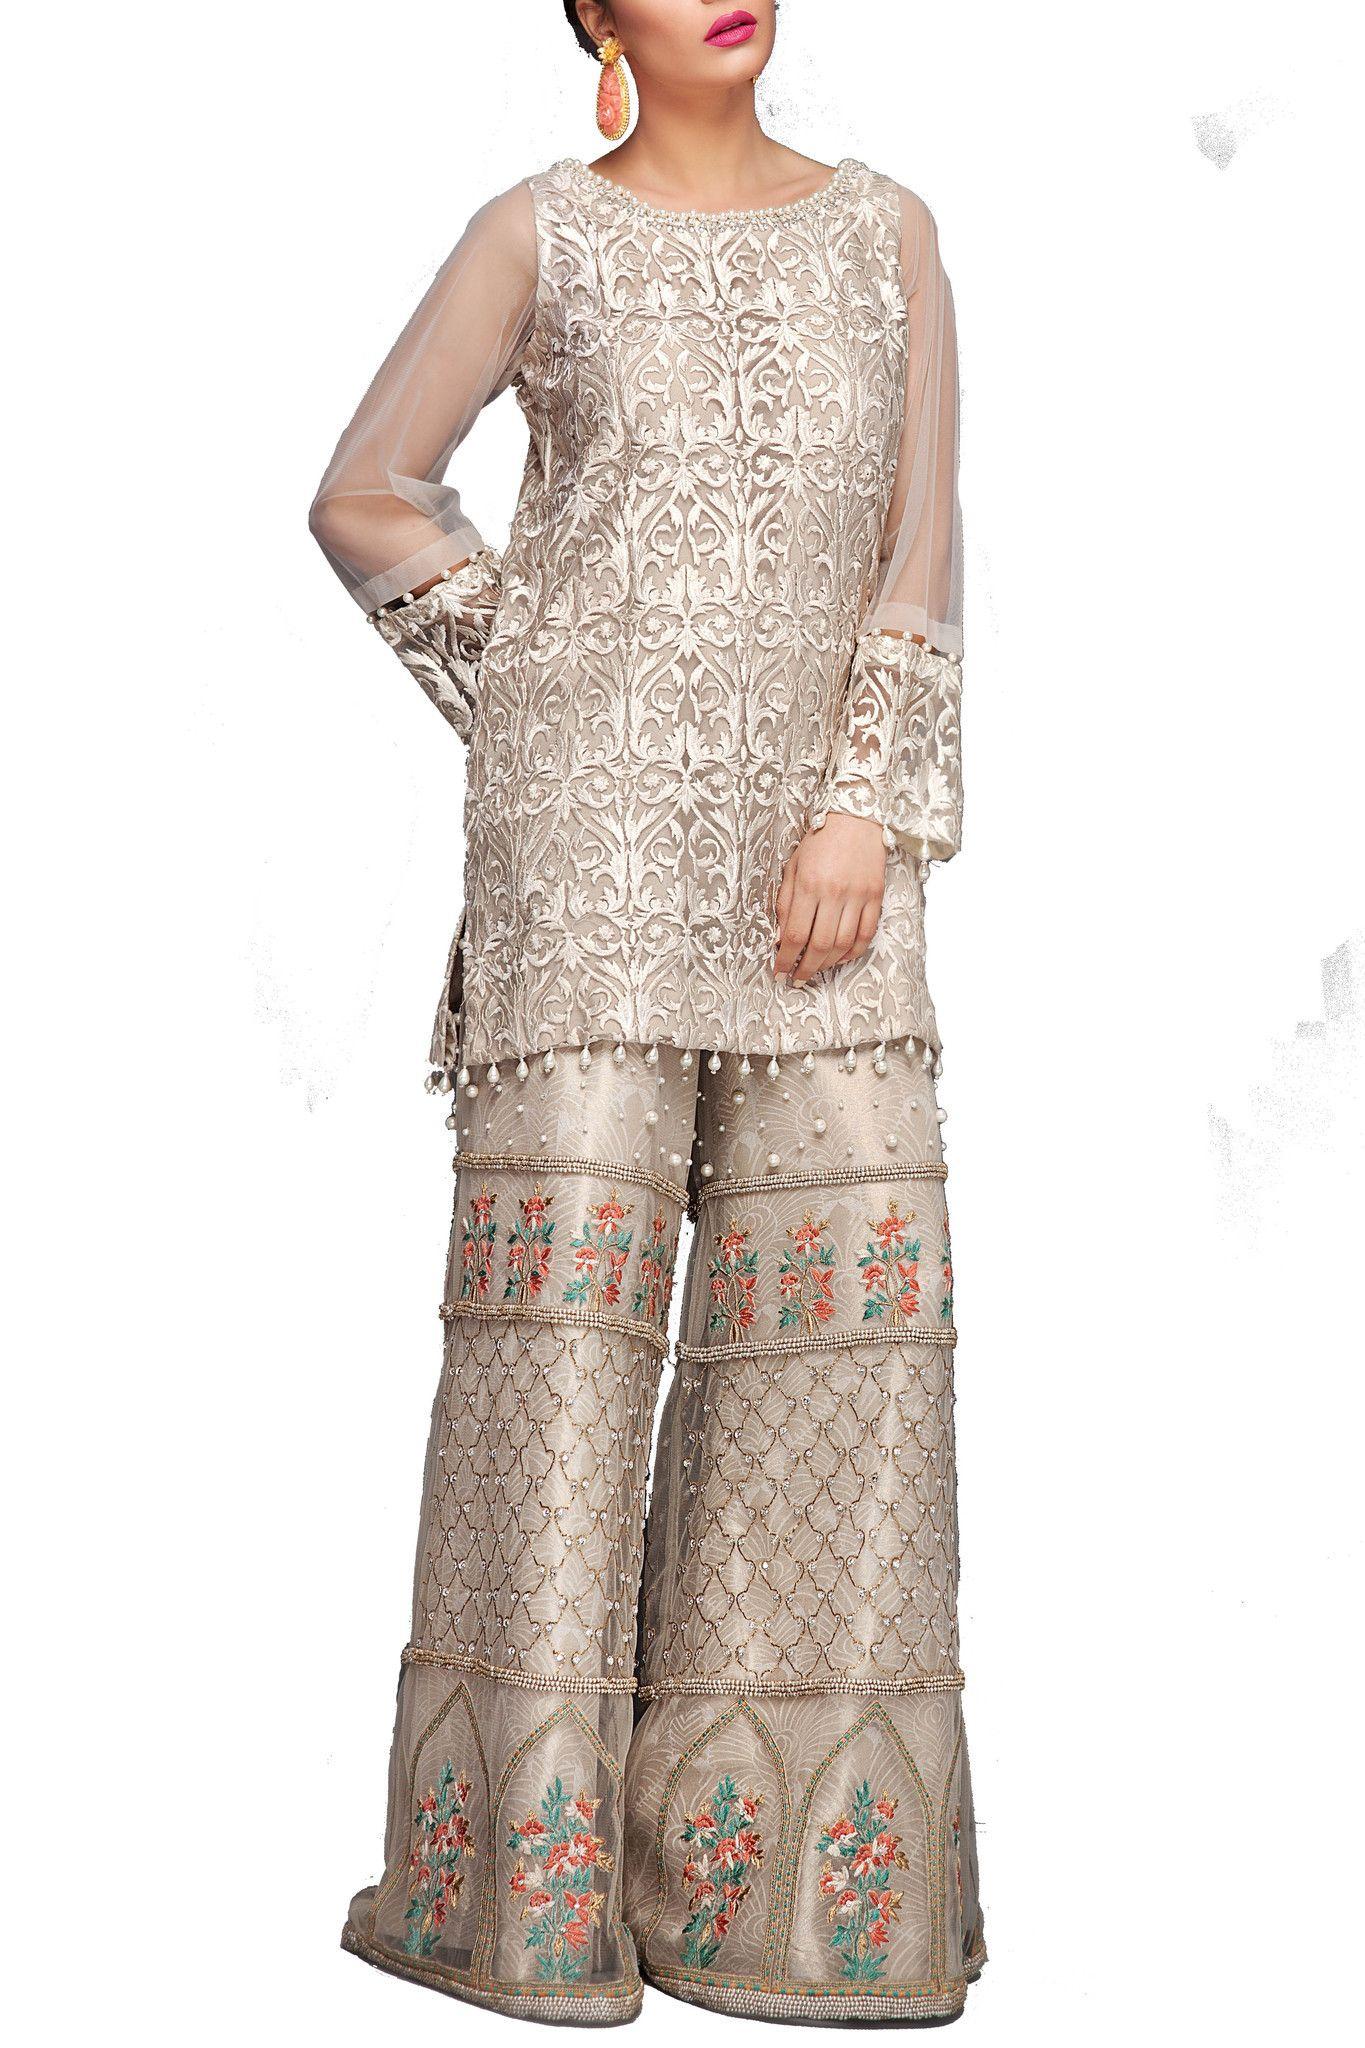 065ecb24ec7a93 Mahgul - White Fully Embroidered Net Shirt With Net Sharara Pants Sharara